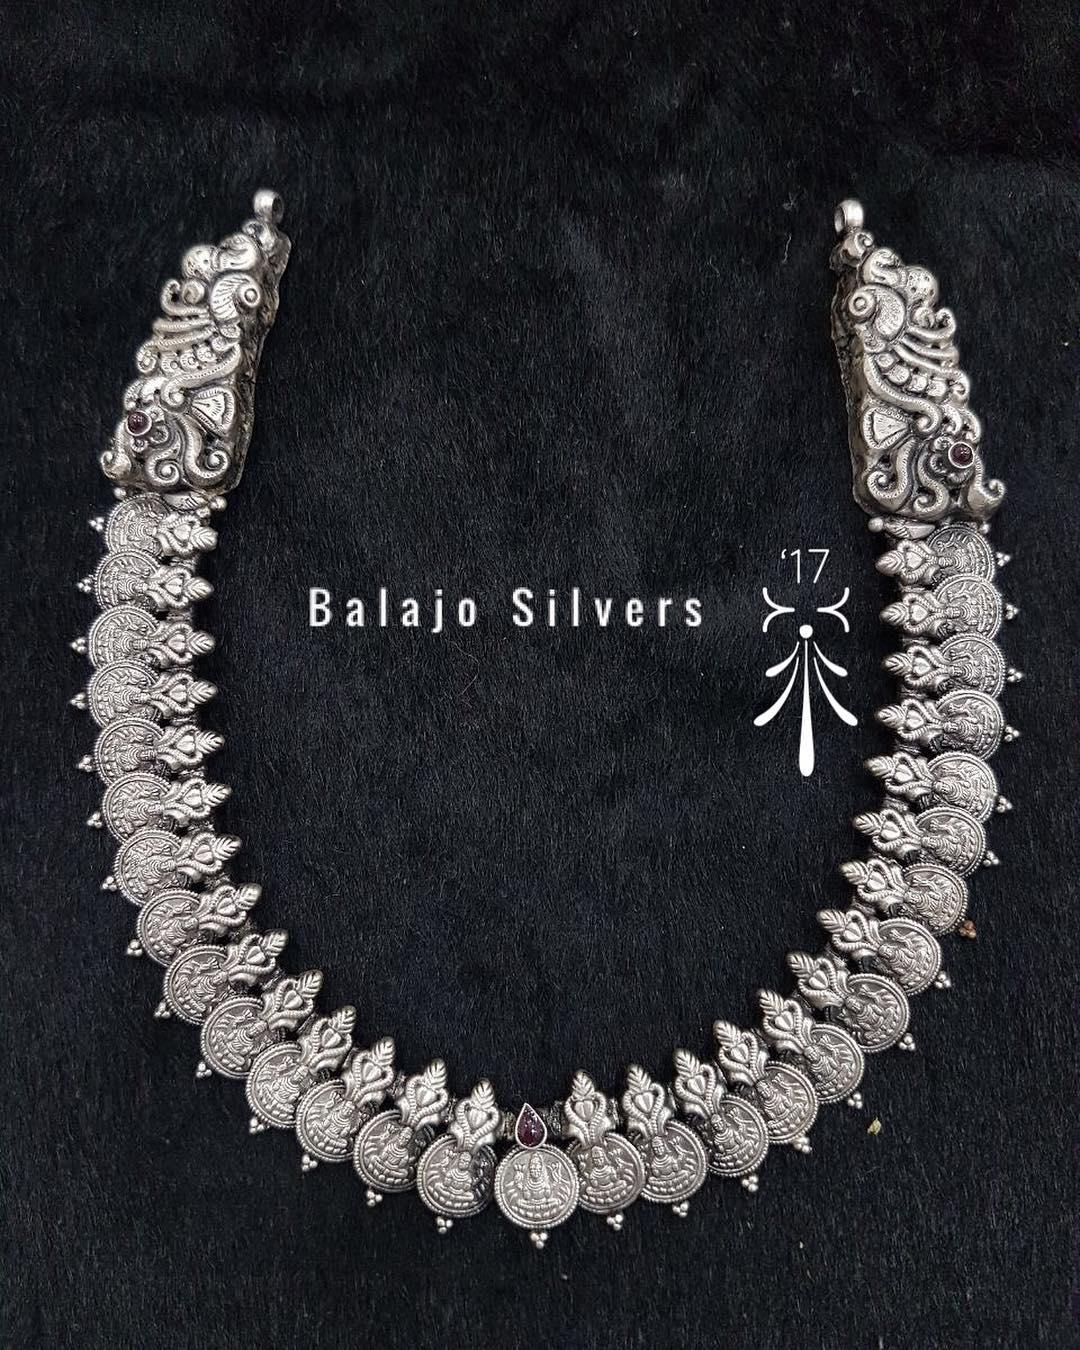 Beautiful Long Necklace From Balaji Silvers